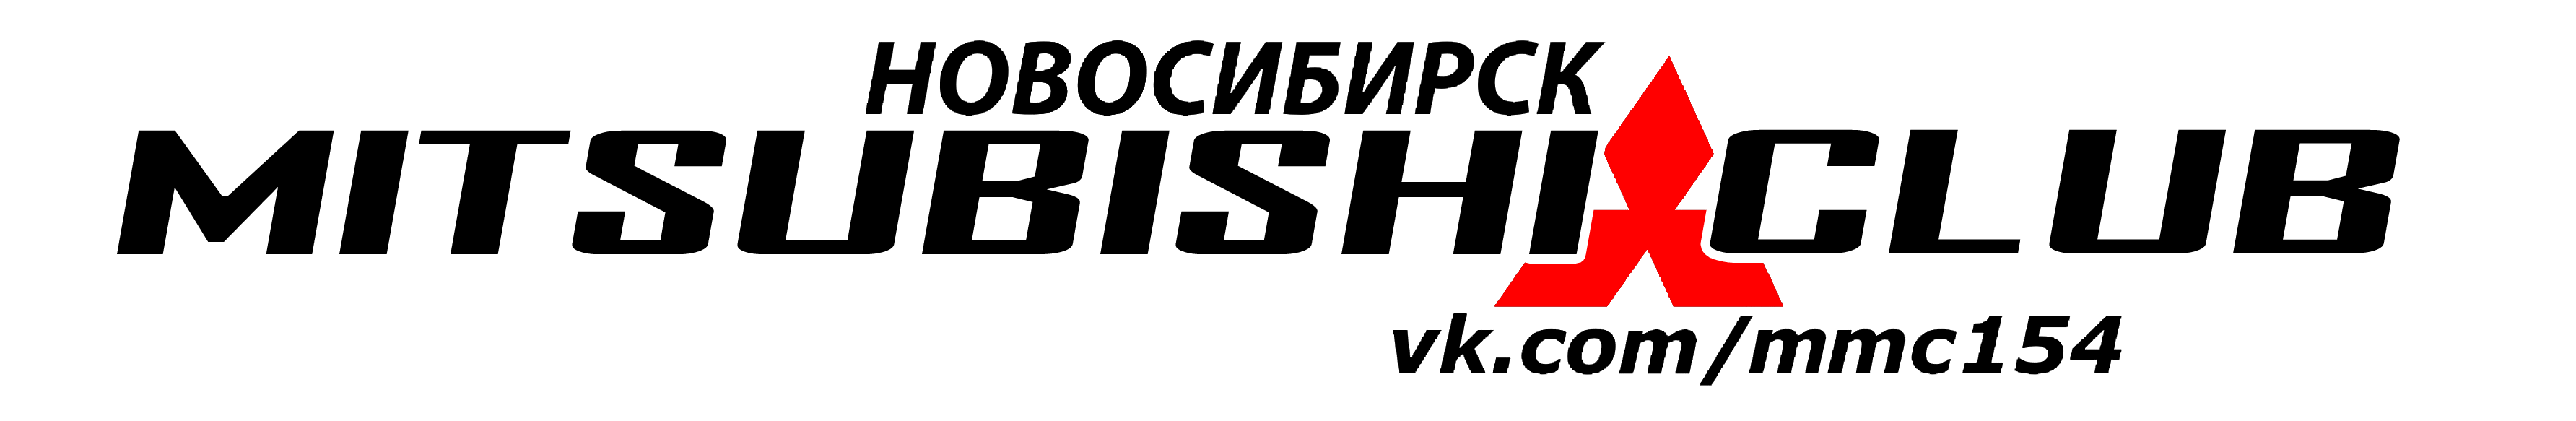 Mitsubishi club Новосибирск